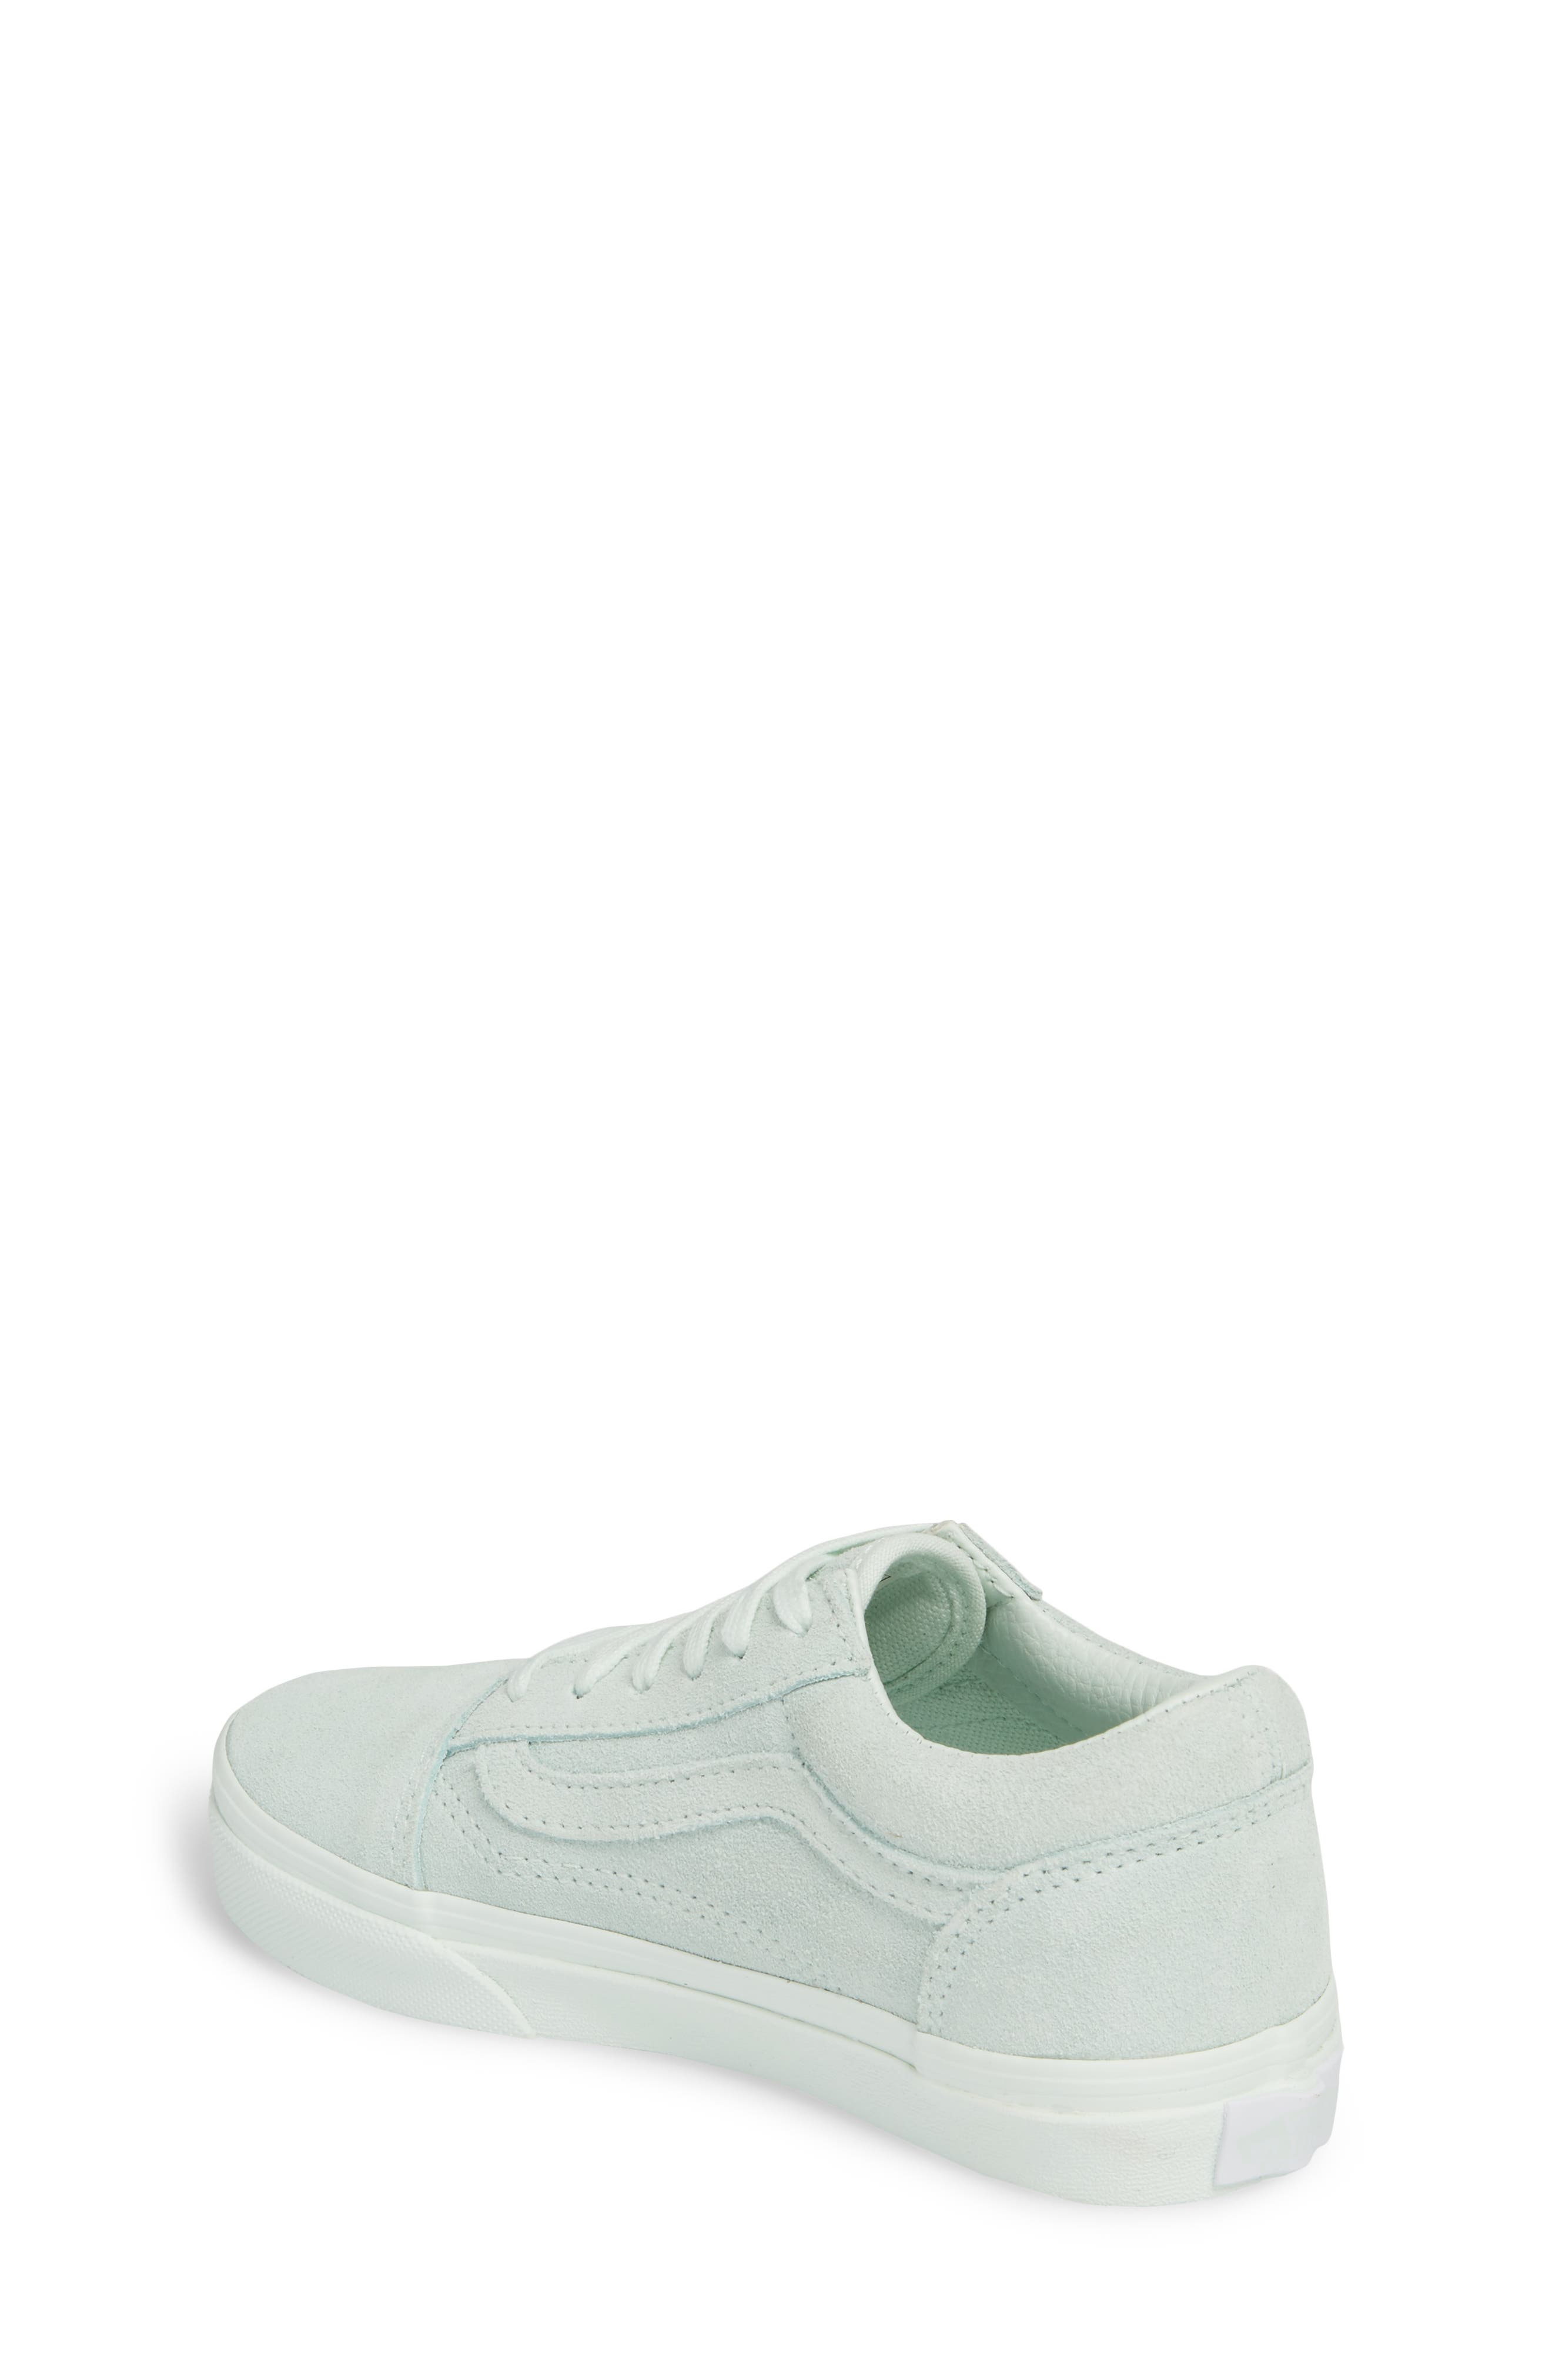 Old Skool Low Top Sneaker,                             Alternate thumbnail 2, color,                             300